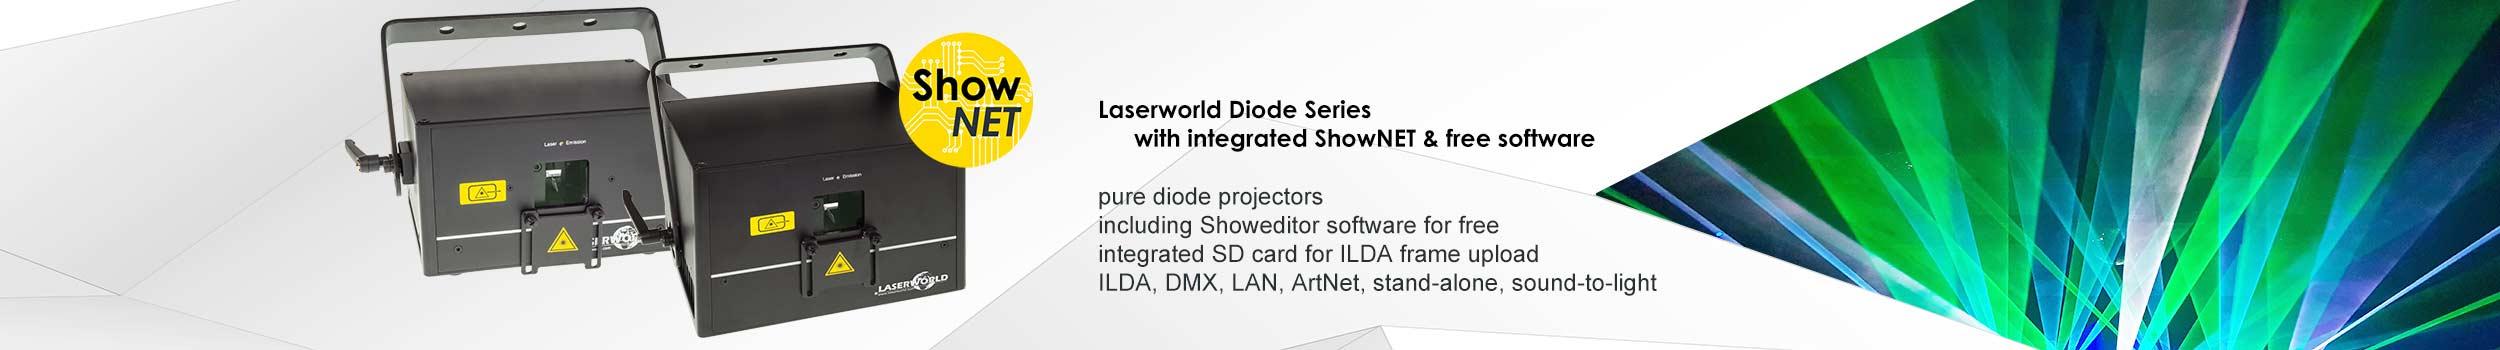 2019_laserworld_header_Diode-Series_en2.jpg